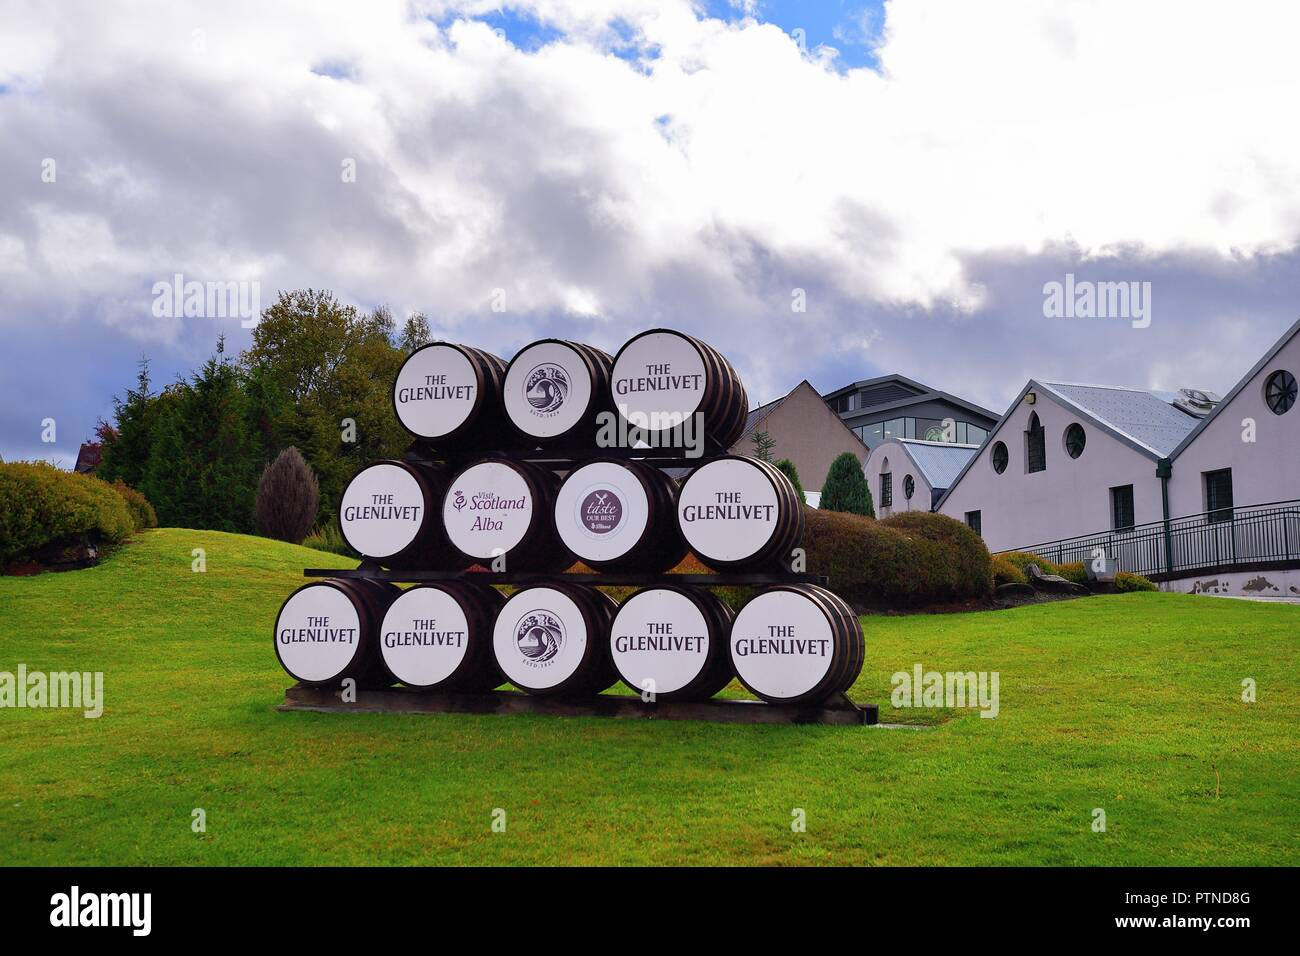 Ballindalloch, Scotland, United Kingdom. The Glenlivit Distillery in the Highlands of Scotland. - Stock Image